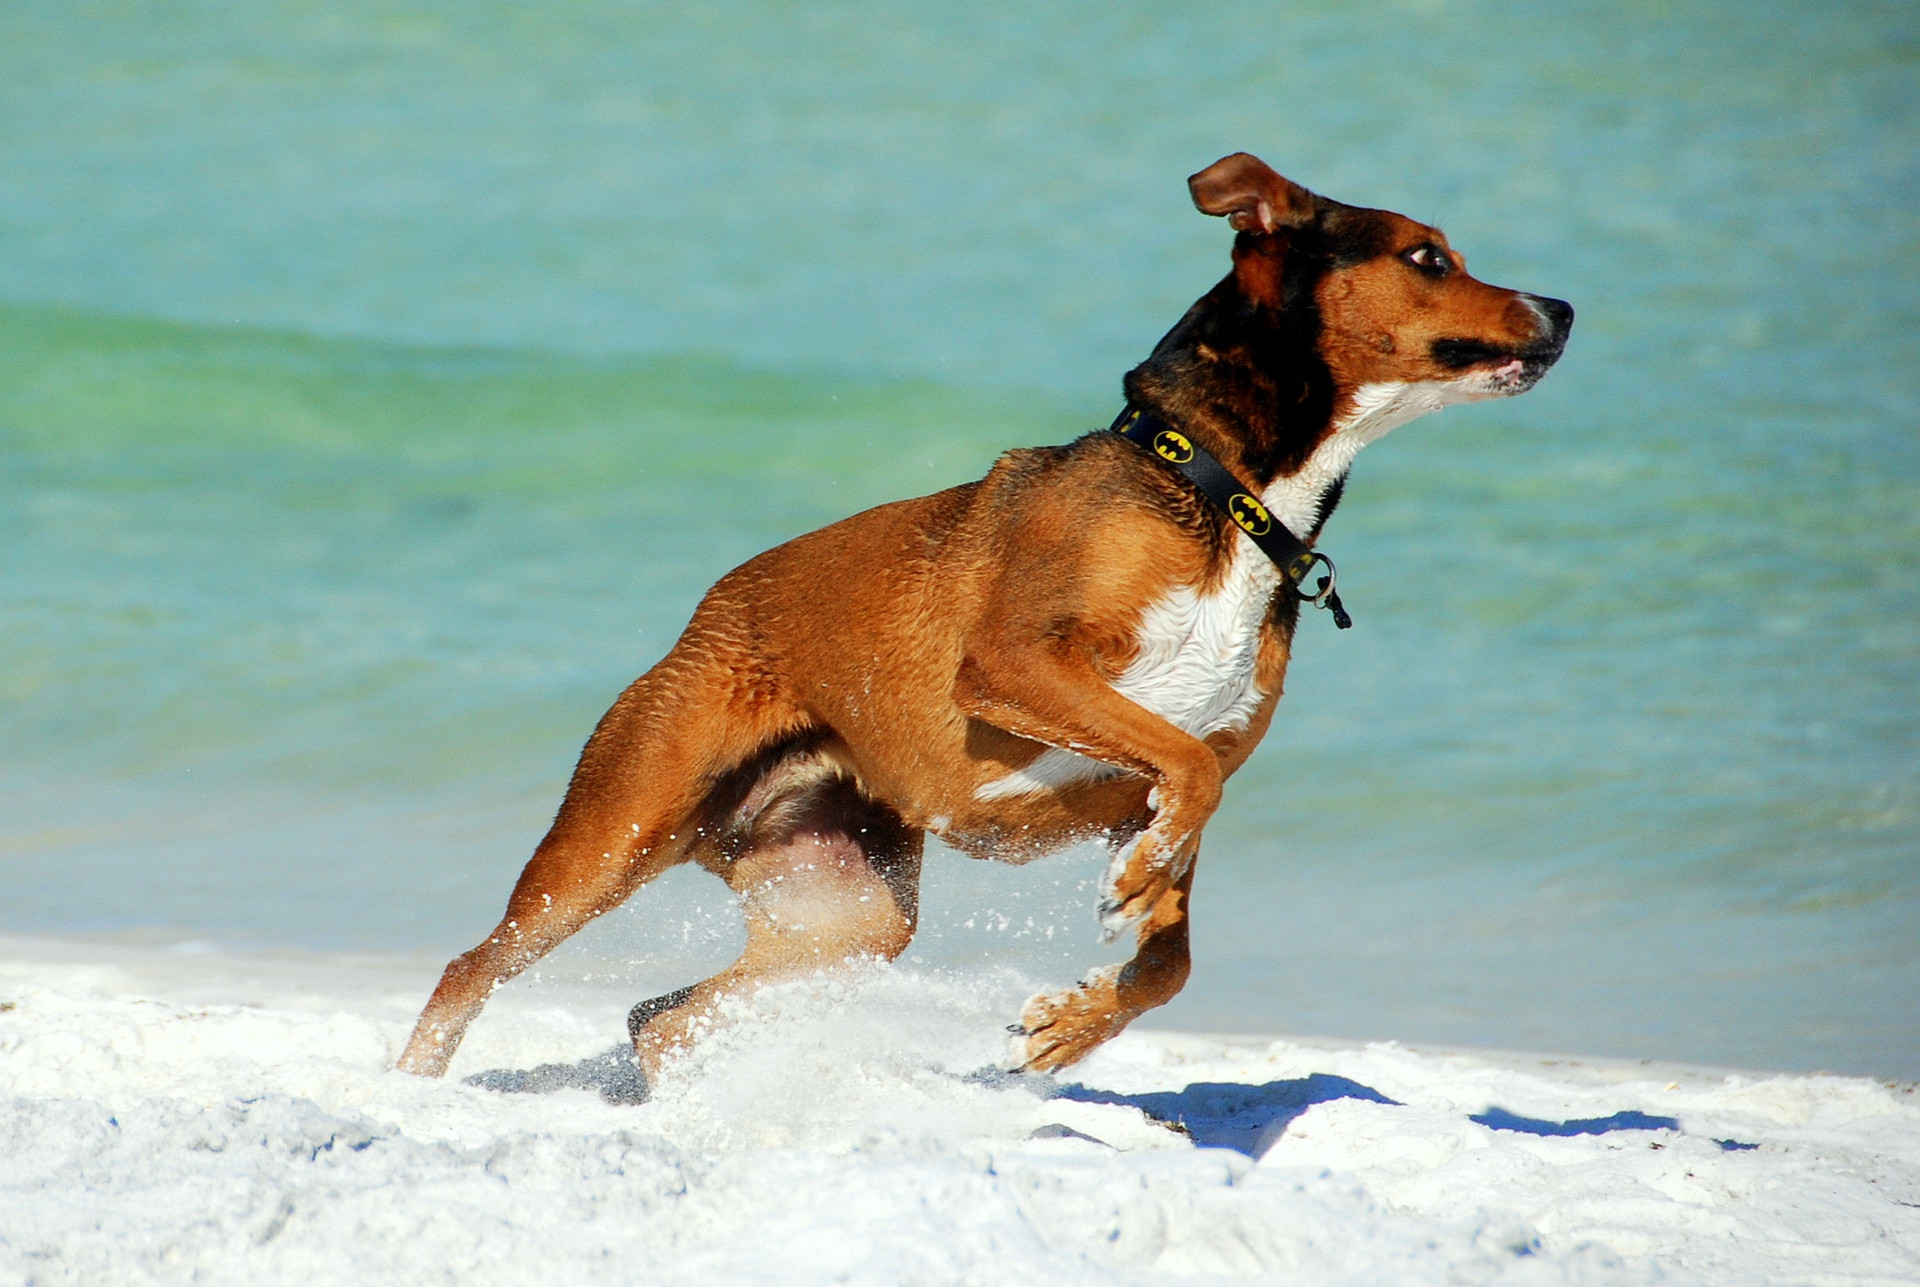 beach-water-nature-sand-ocean-shore-8953